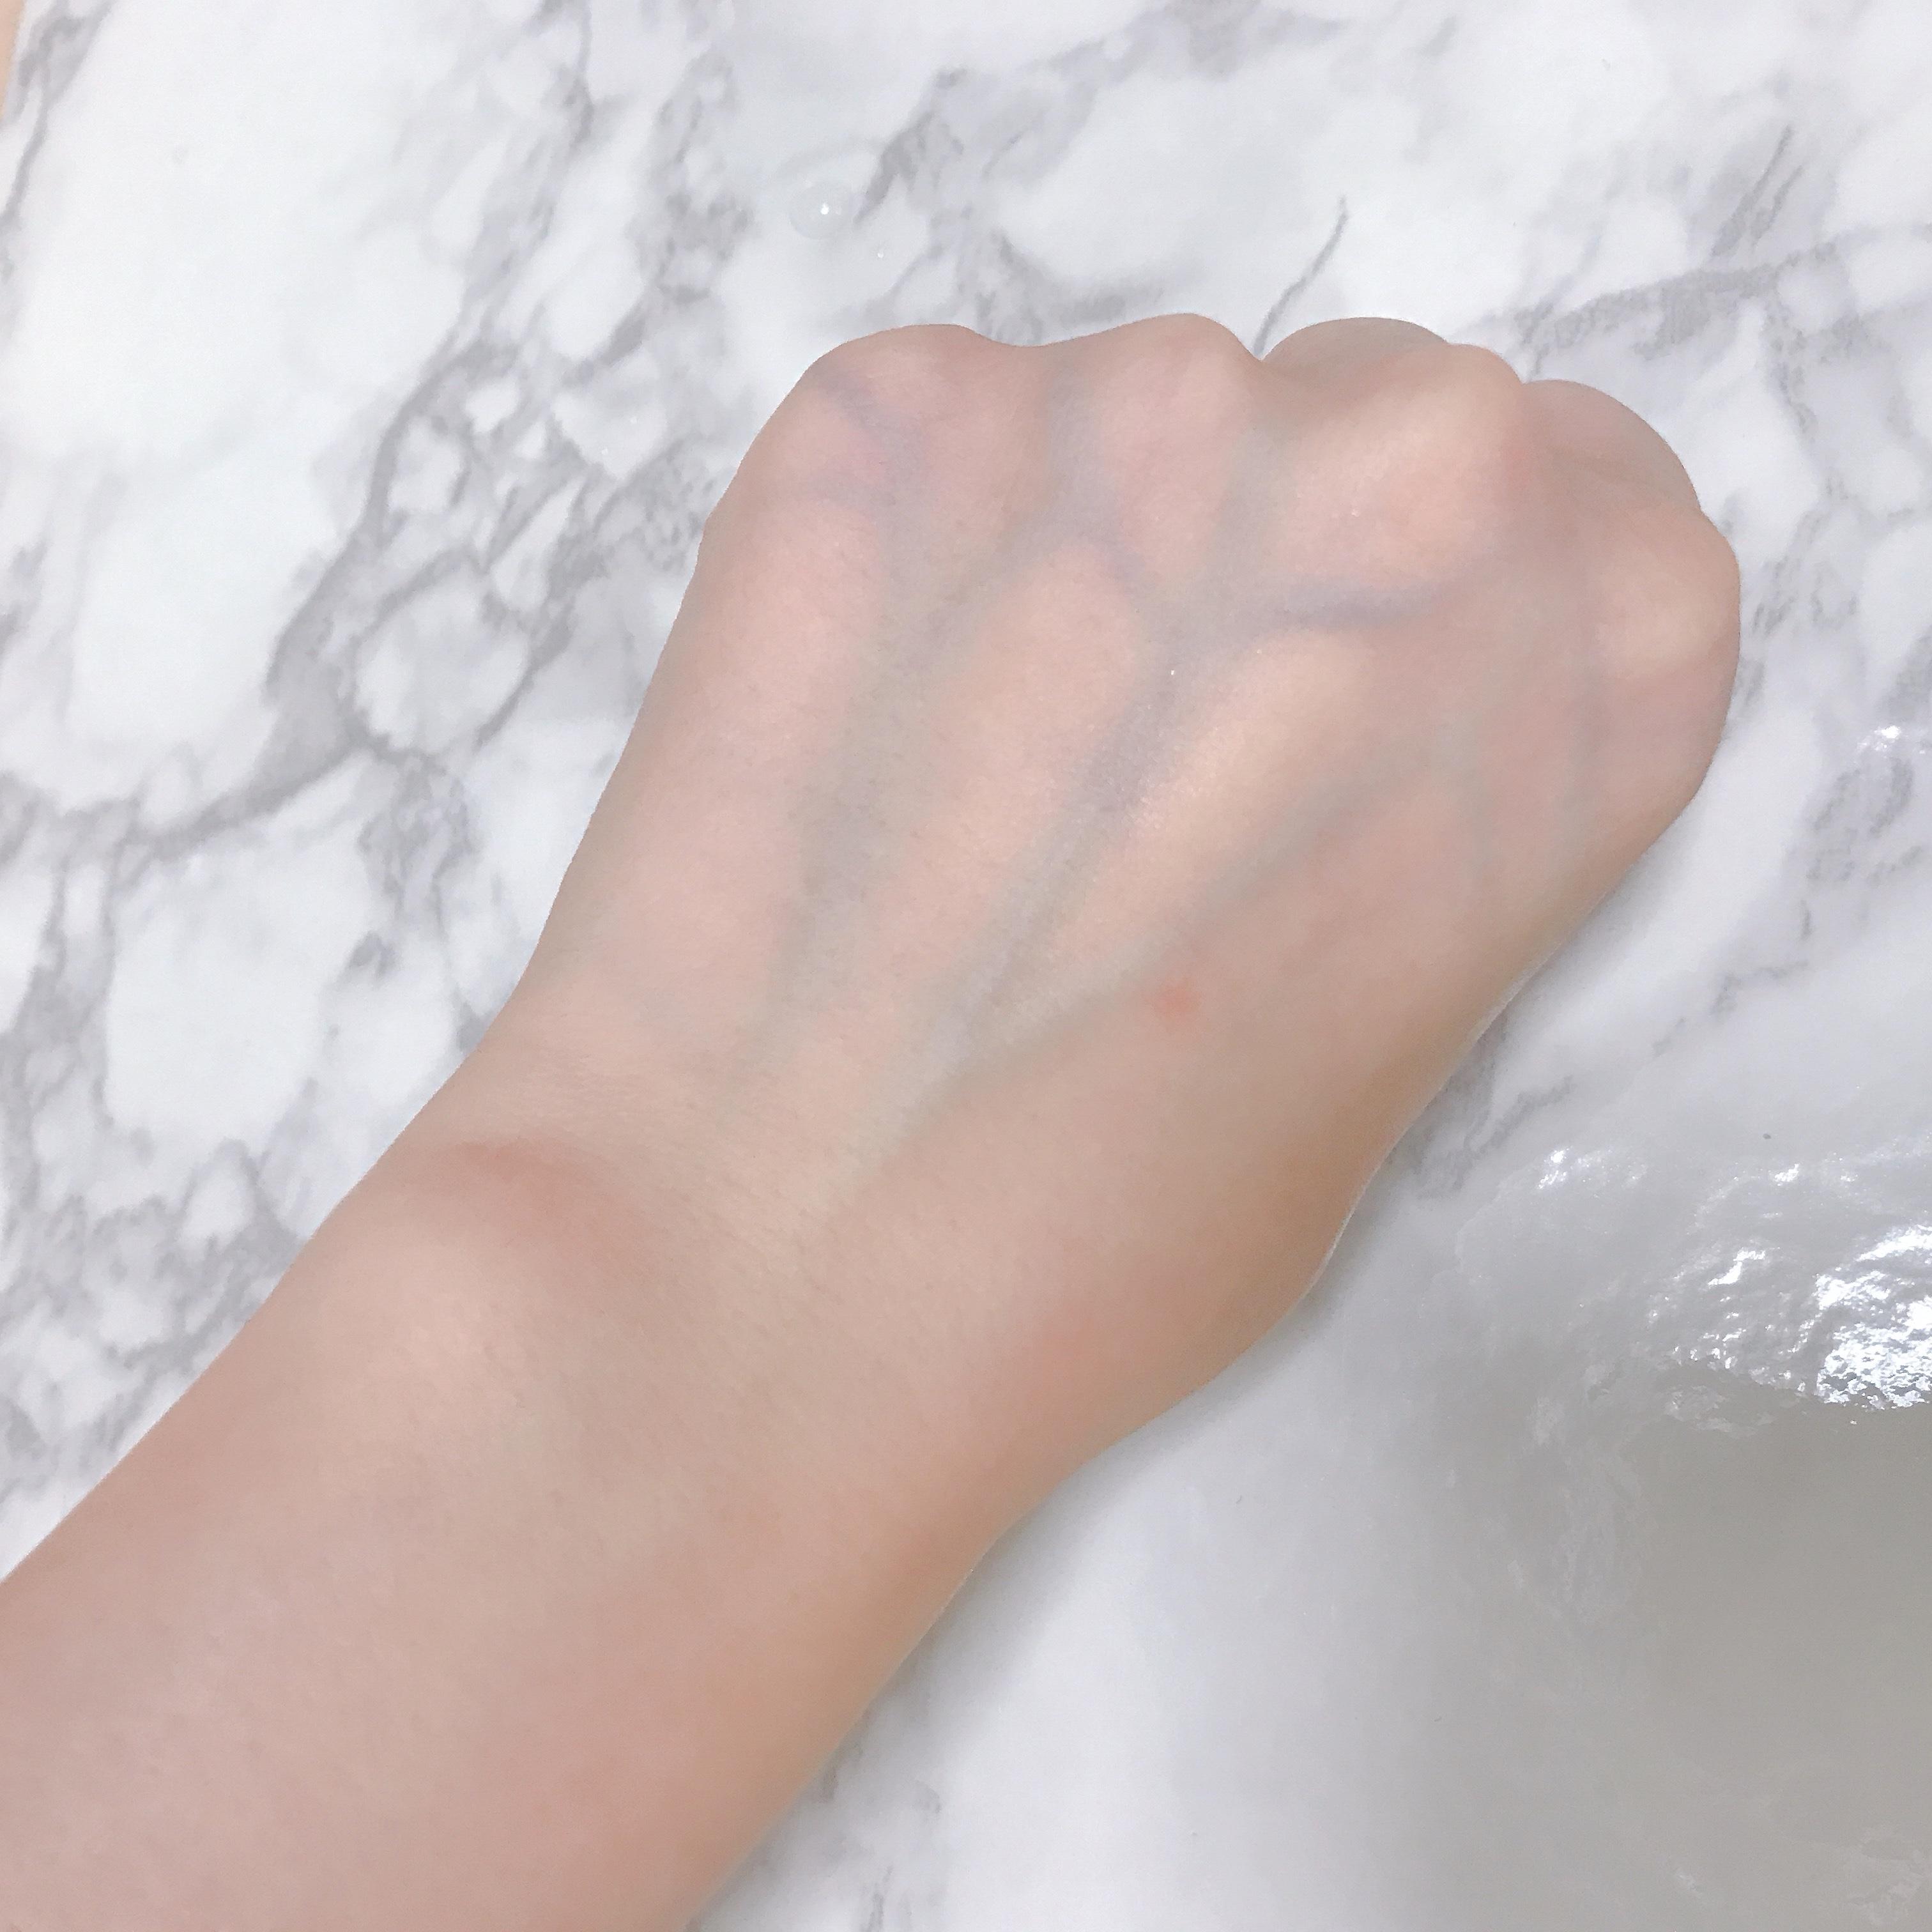 《OLBIS U》透明感の肌をつくる!毛穴の汚れ・くすみを無くしてくれる魔法の洗顔はオルビスユーがオススメ❤︎_4